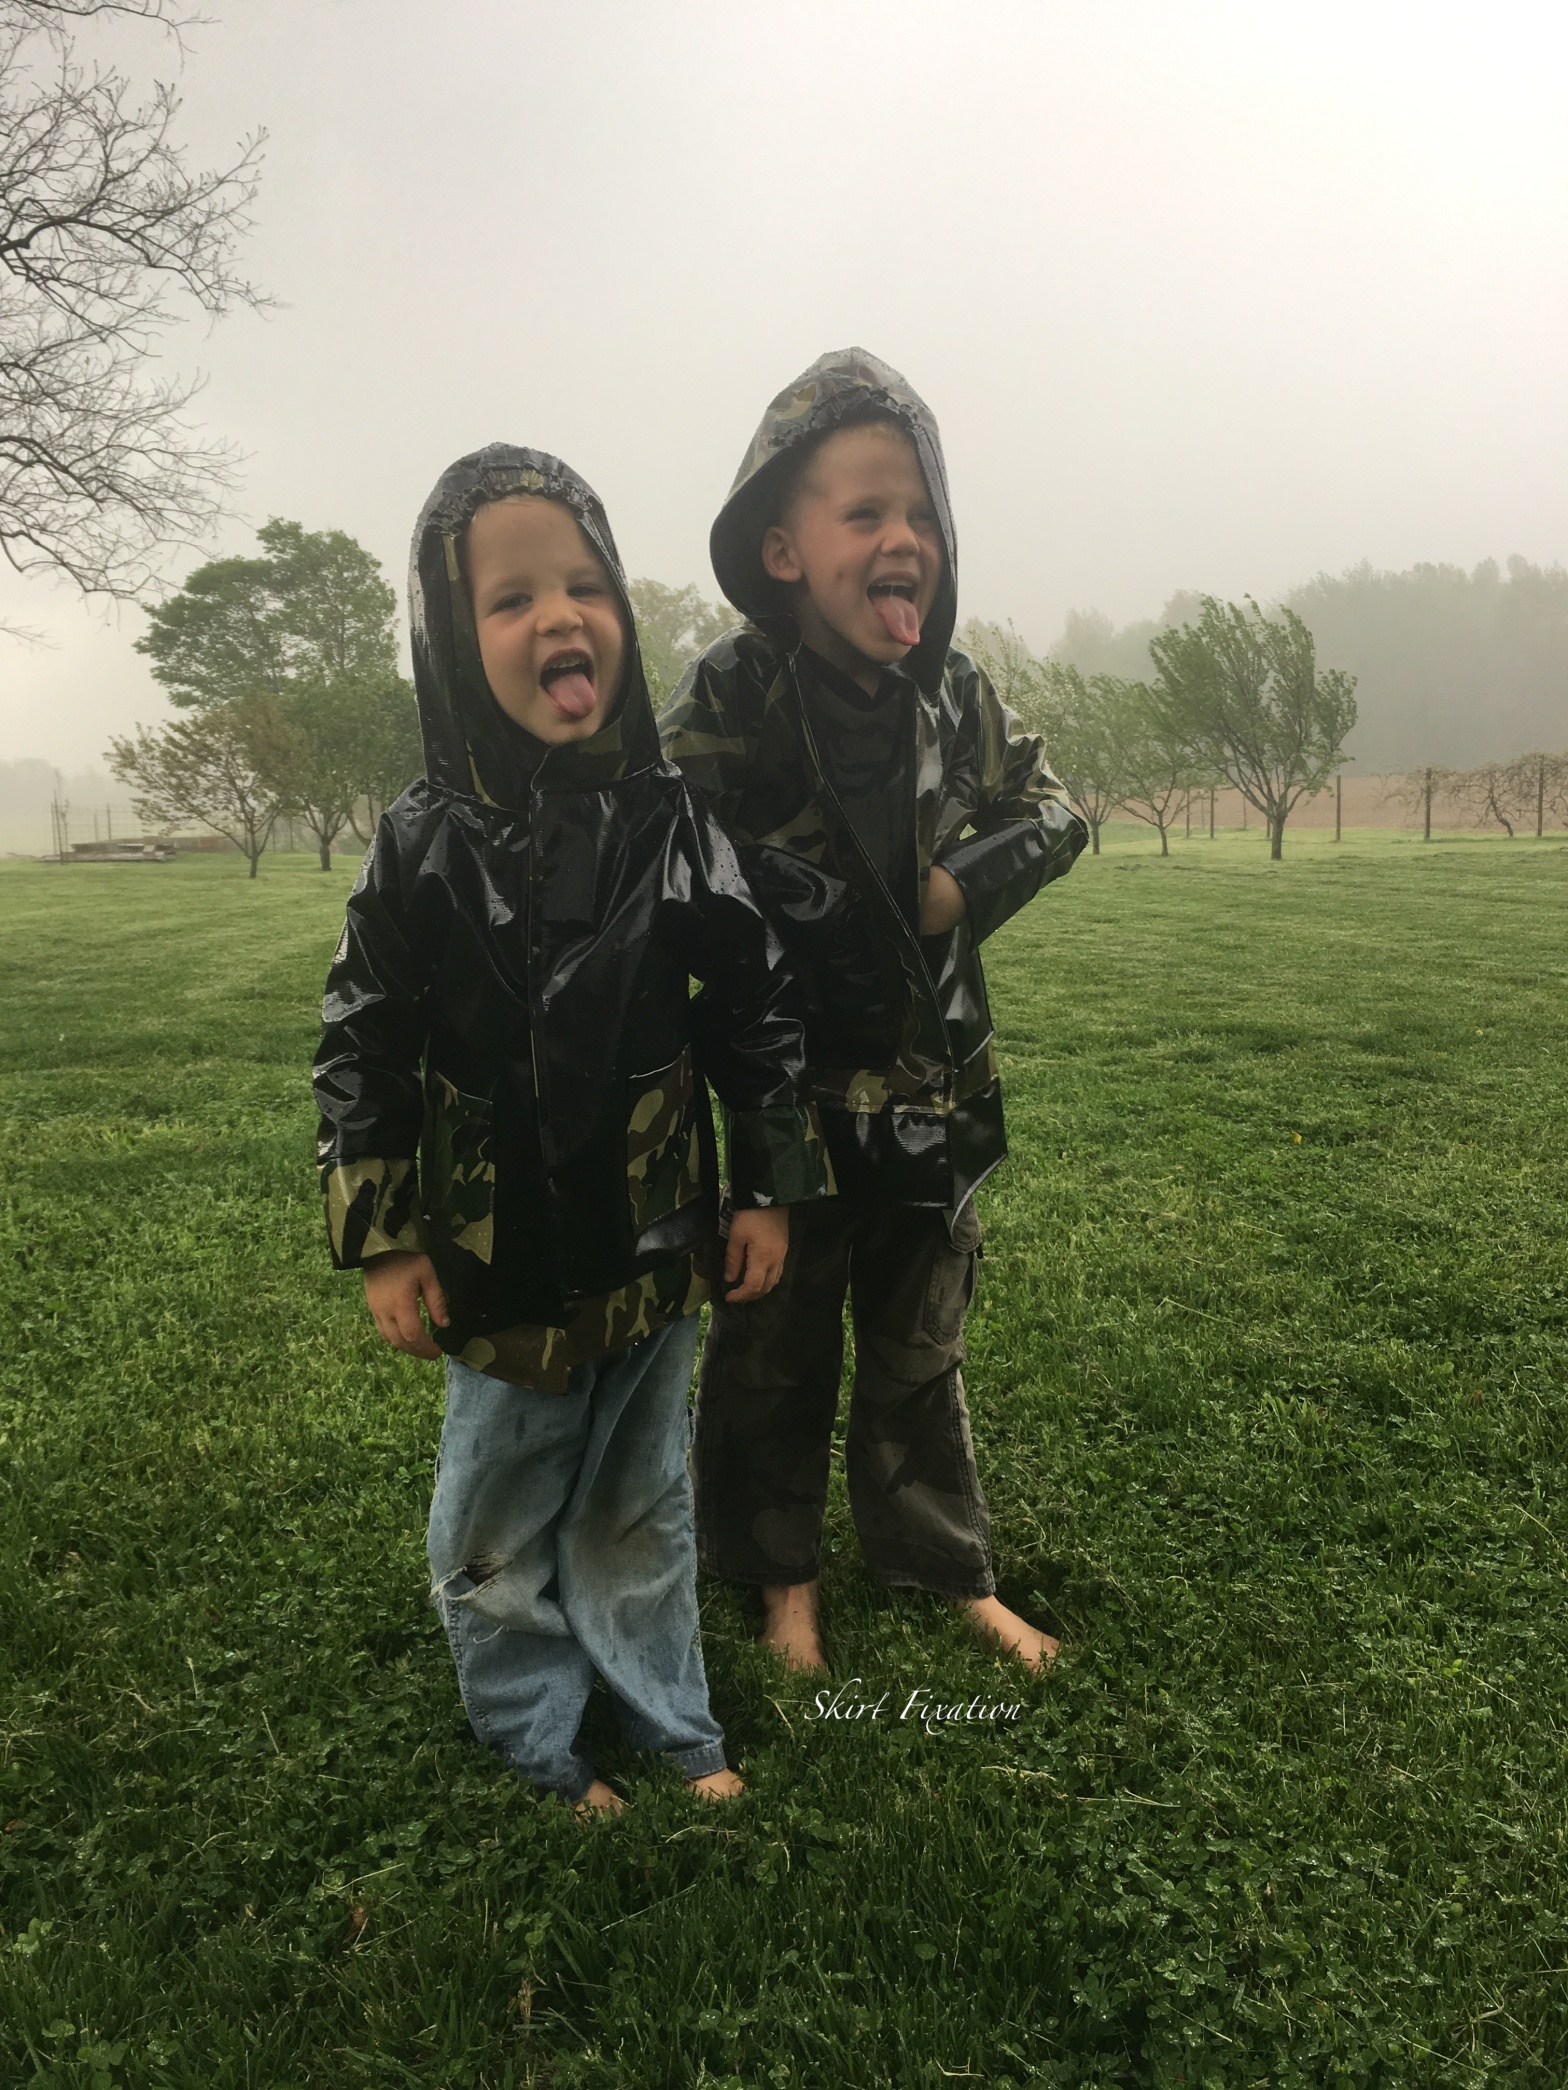 Rain jackets sewn by Skirt Fixation